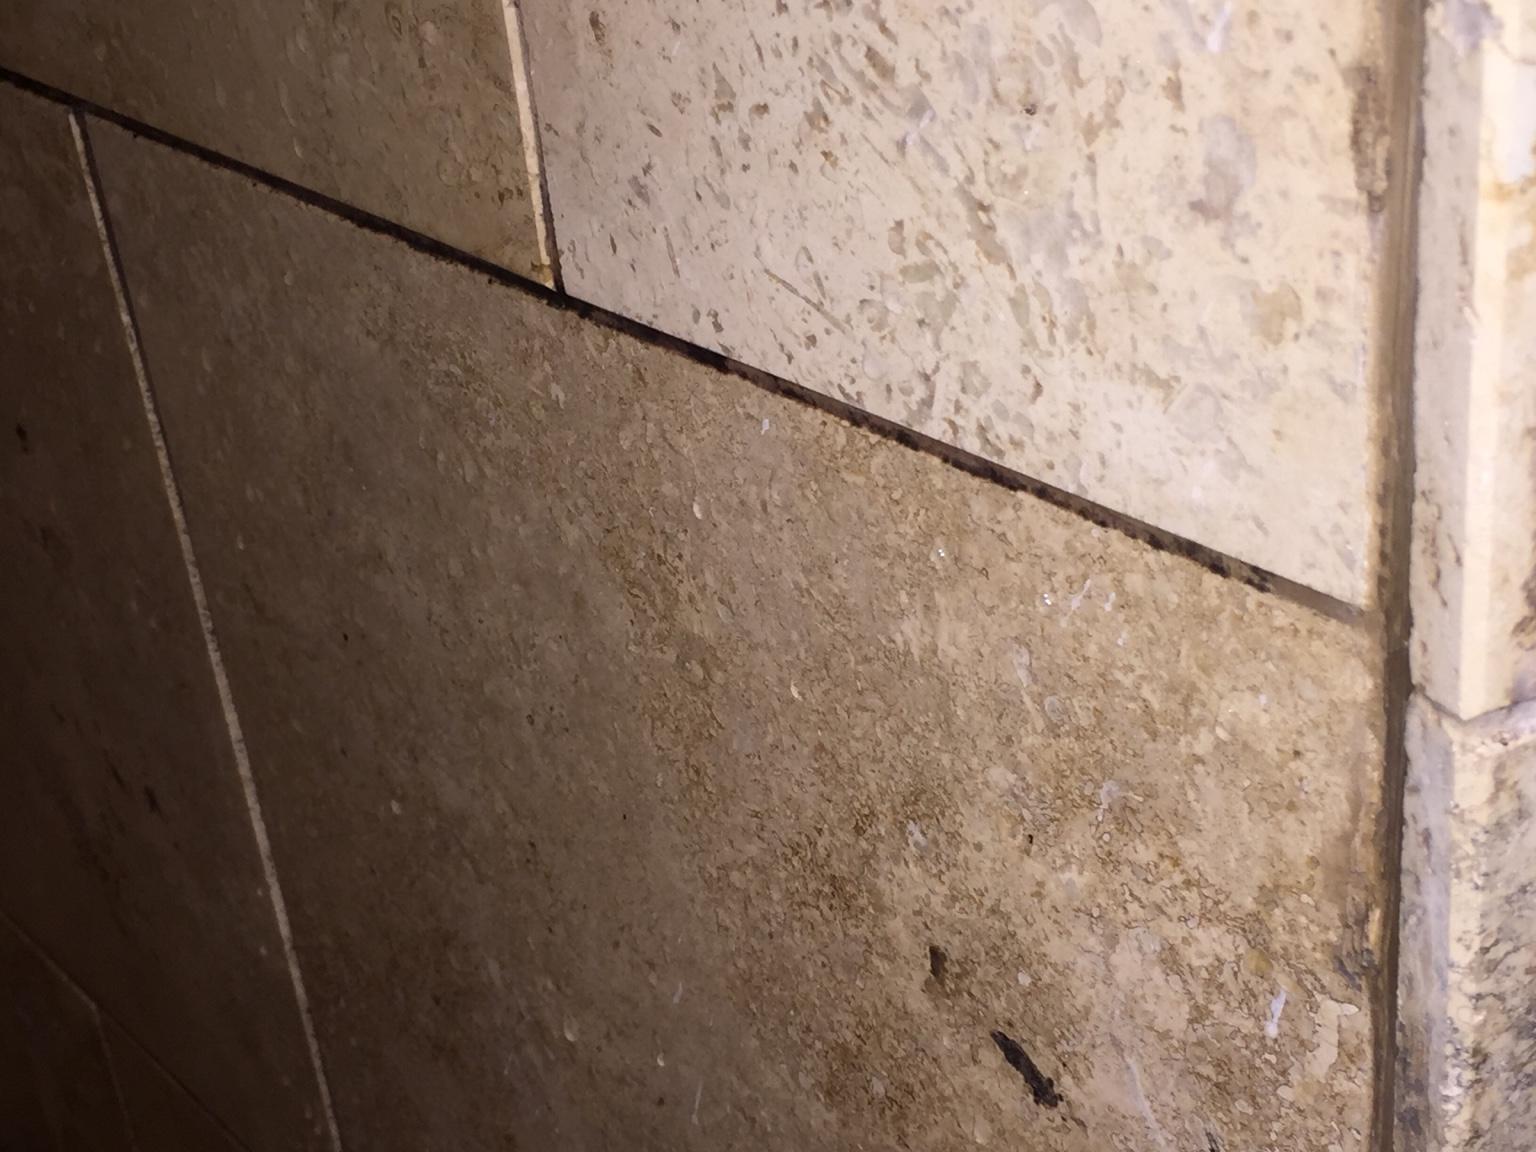 Of posts ceramic tile advice forums john bridge ceramic tile - E56fd5d980531d595ac550b0623234d8 Jpg